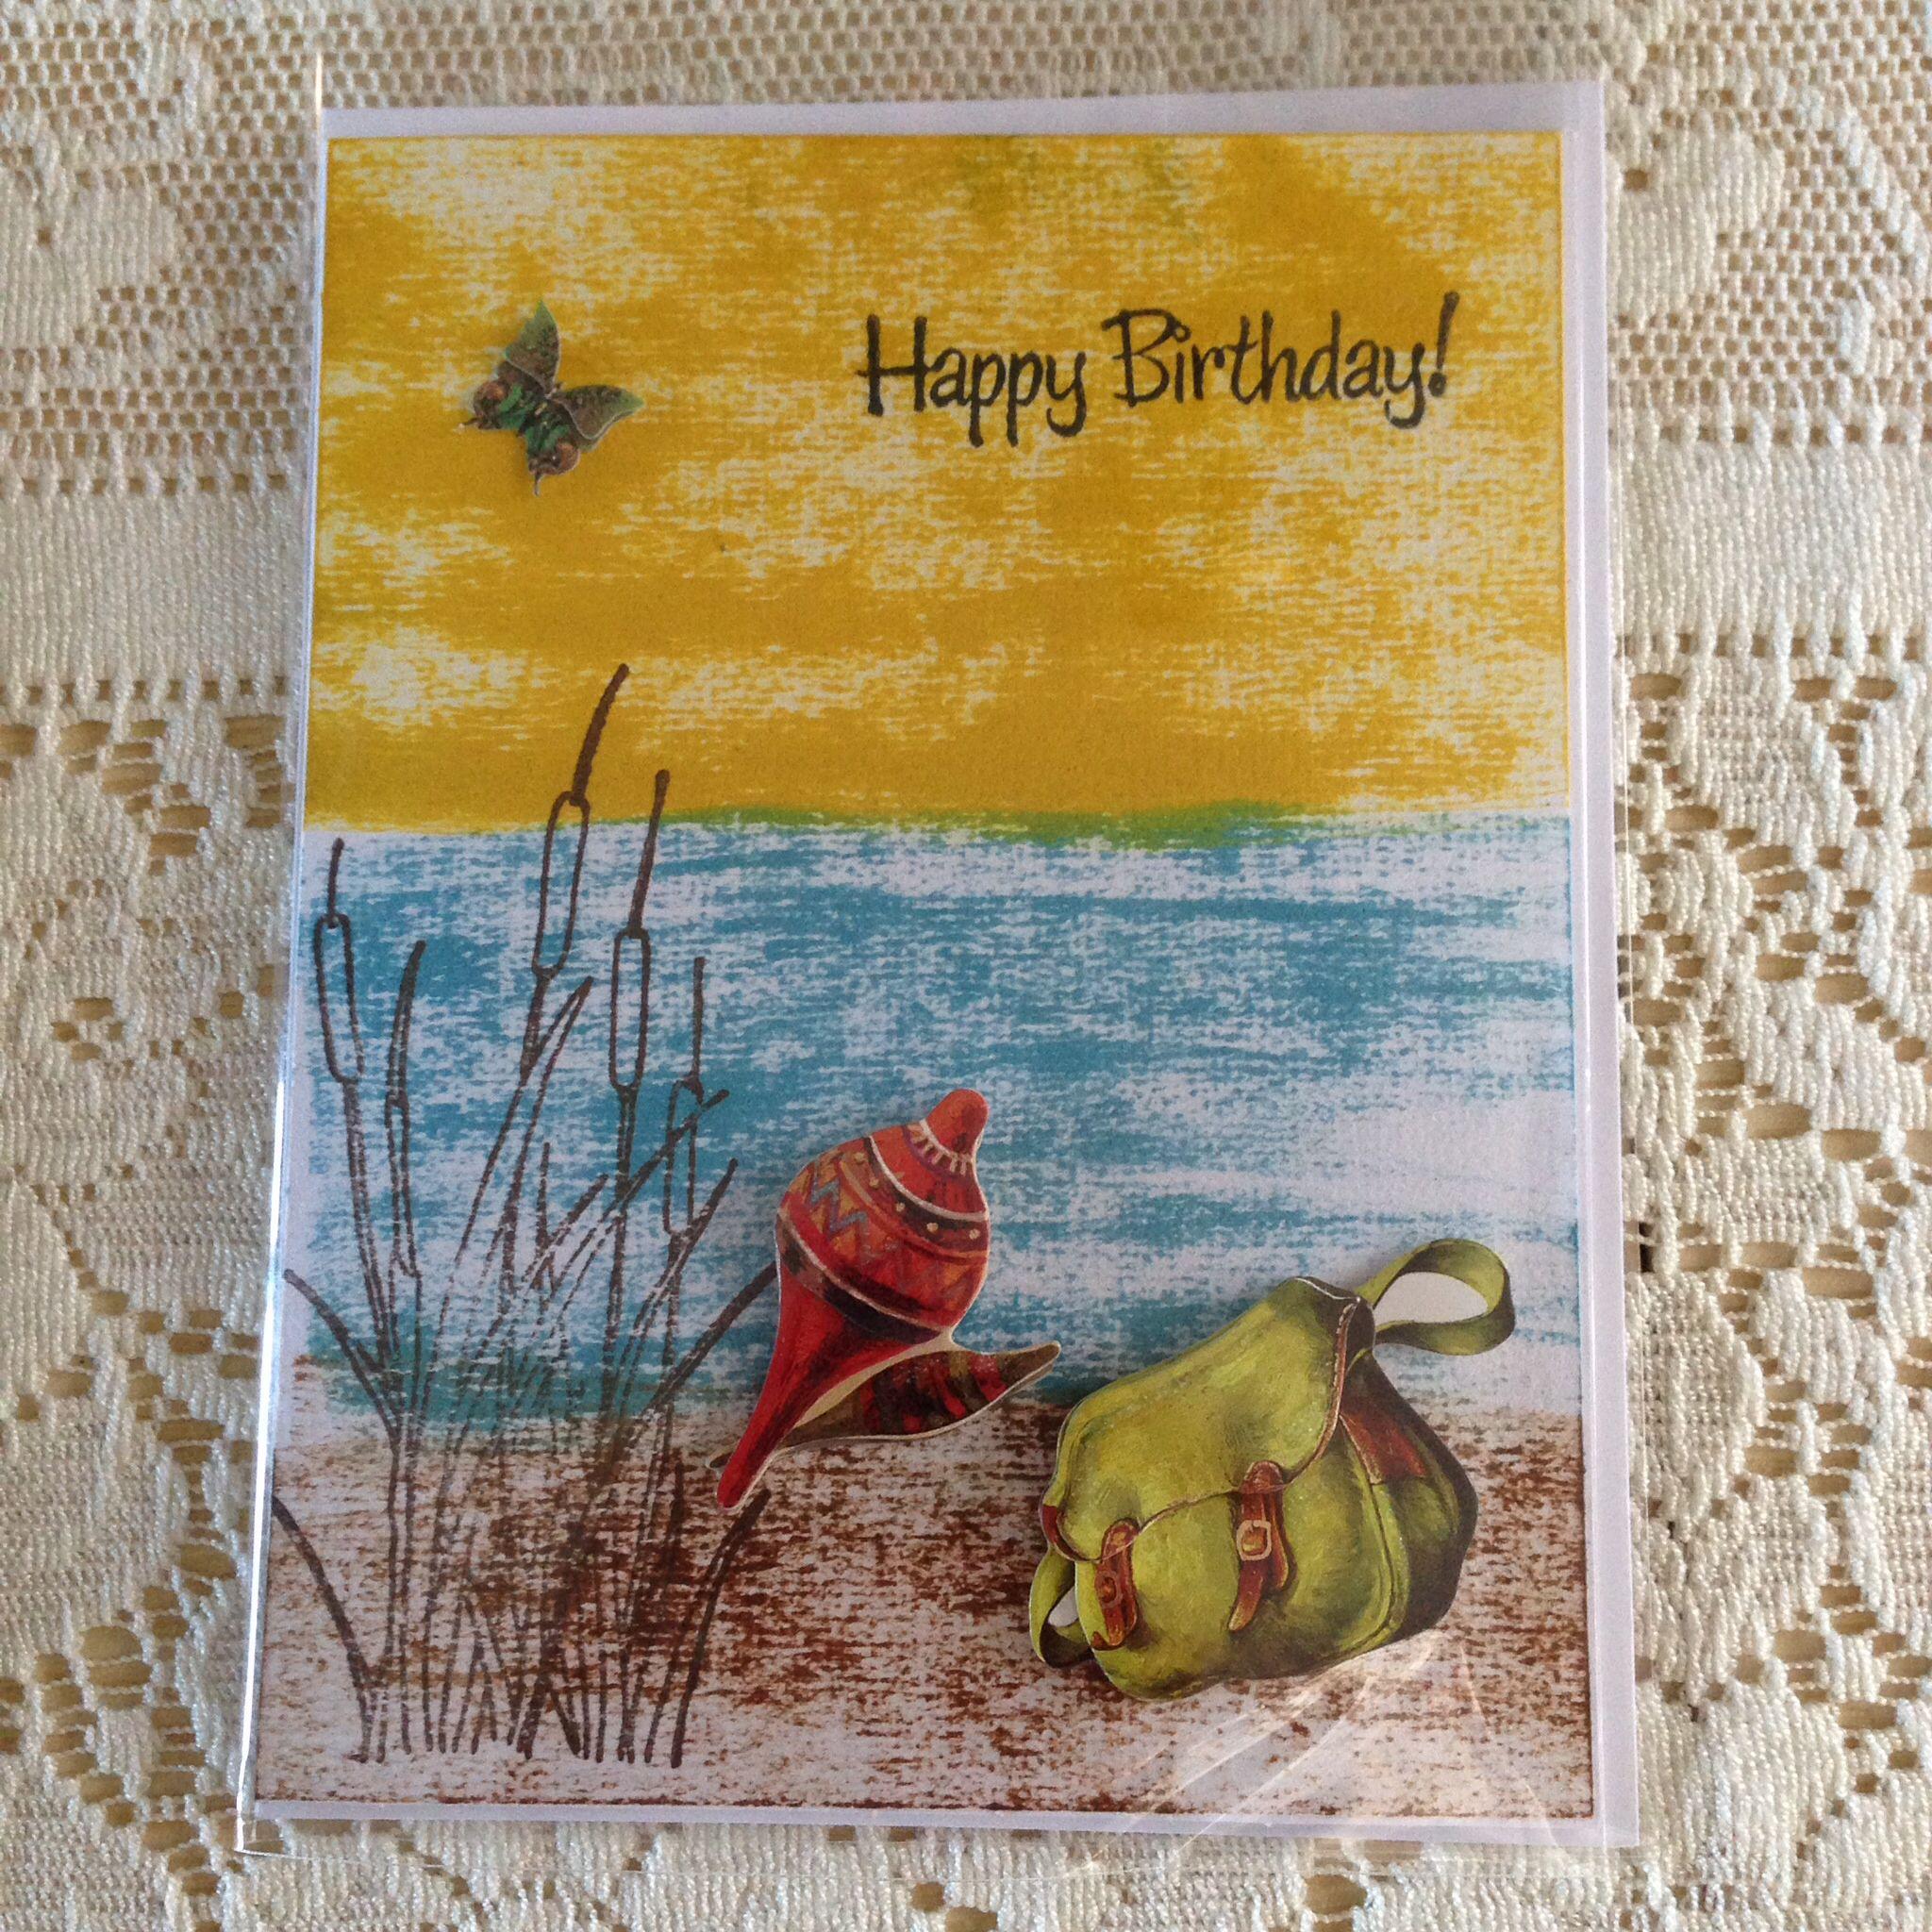 Handmade cardmale birthdayfishing rickis handmade cards handmade cardmale birthdayfishing kristyandbryce Choice Image